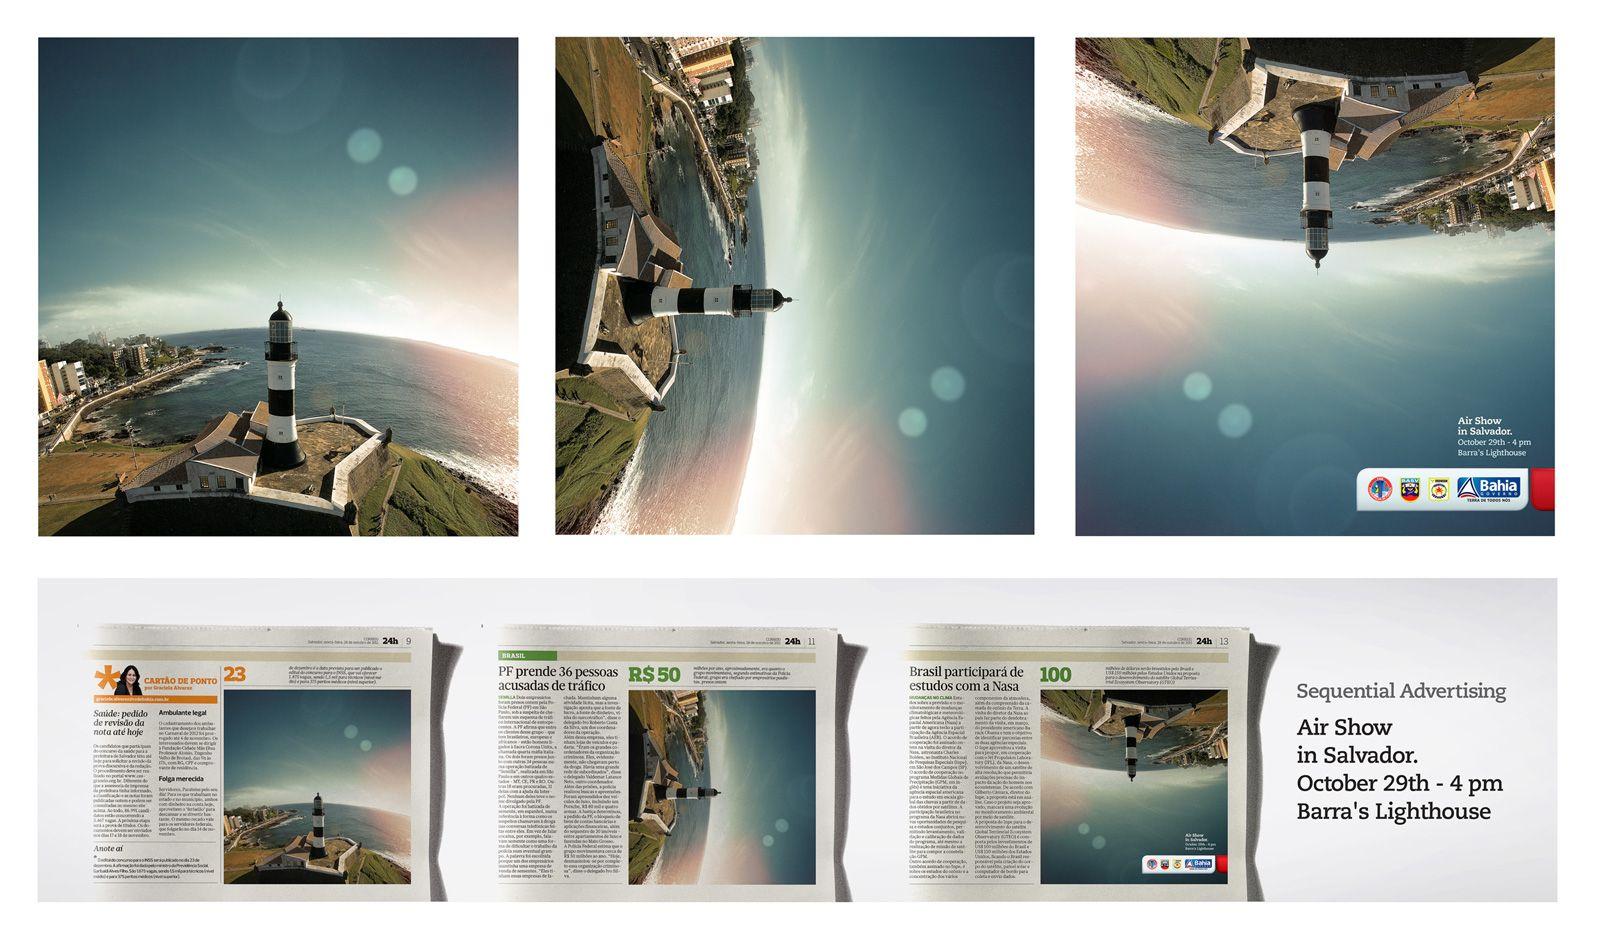 Air Show Ads Print Ads Air Show Great Ads